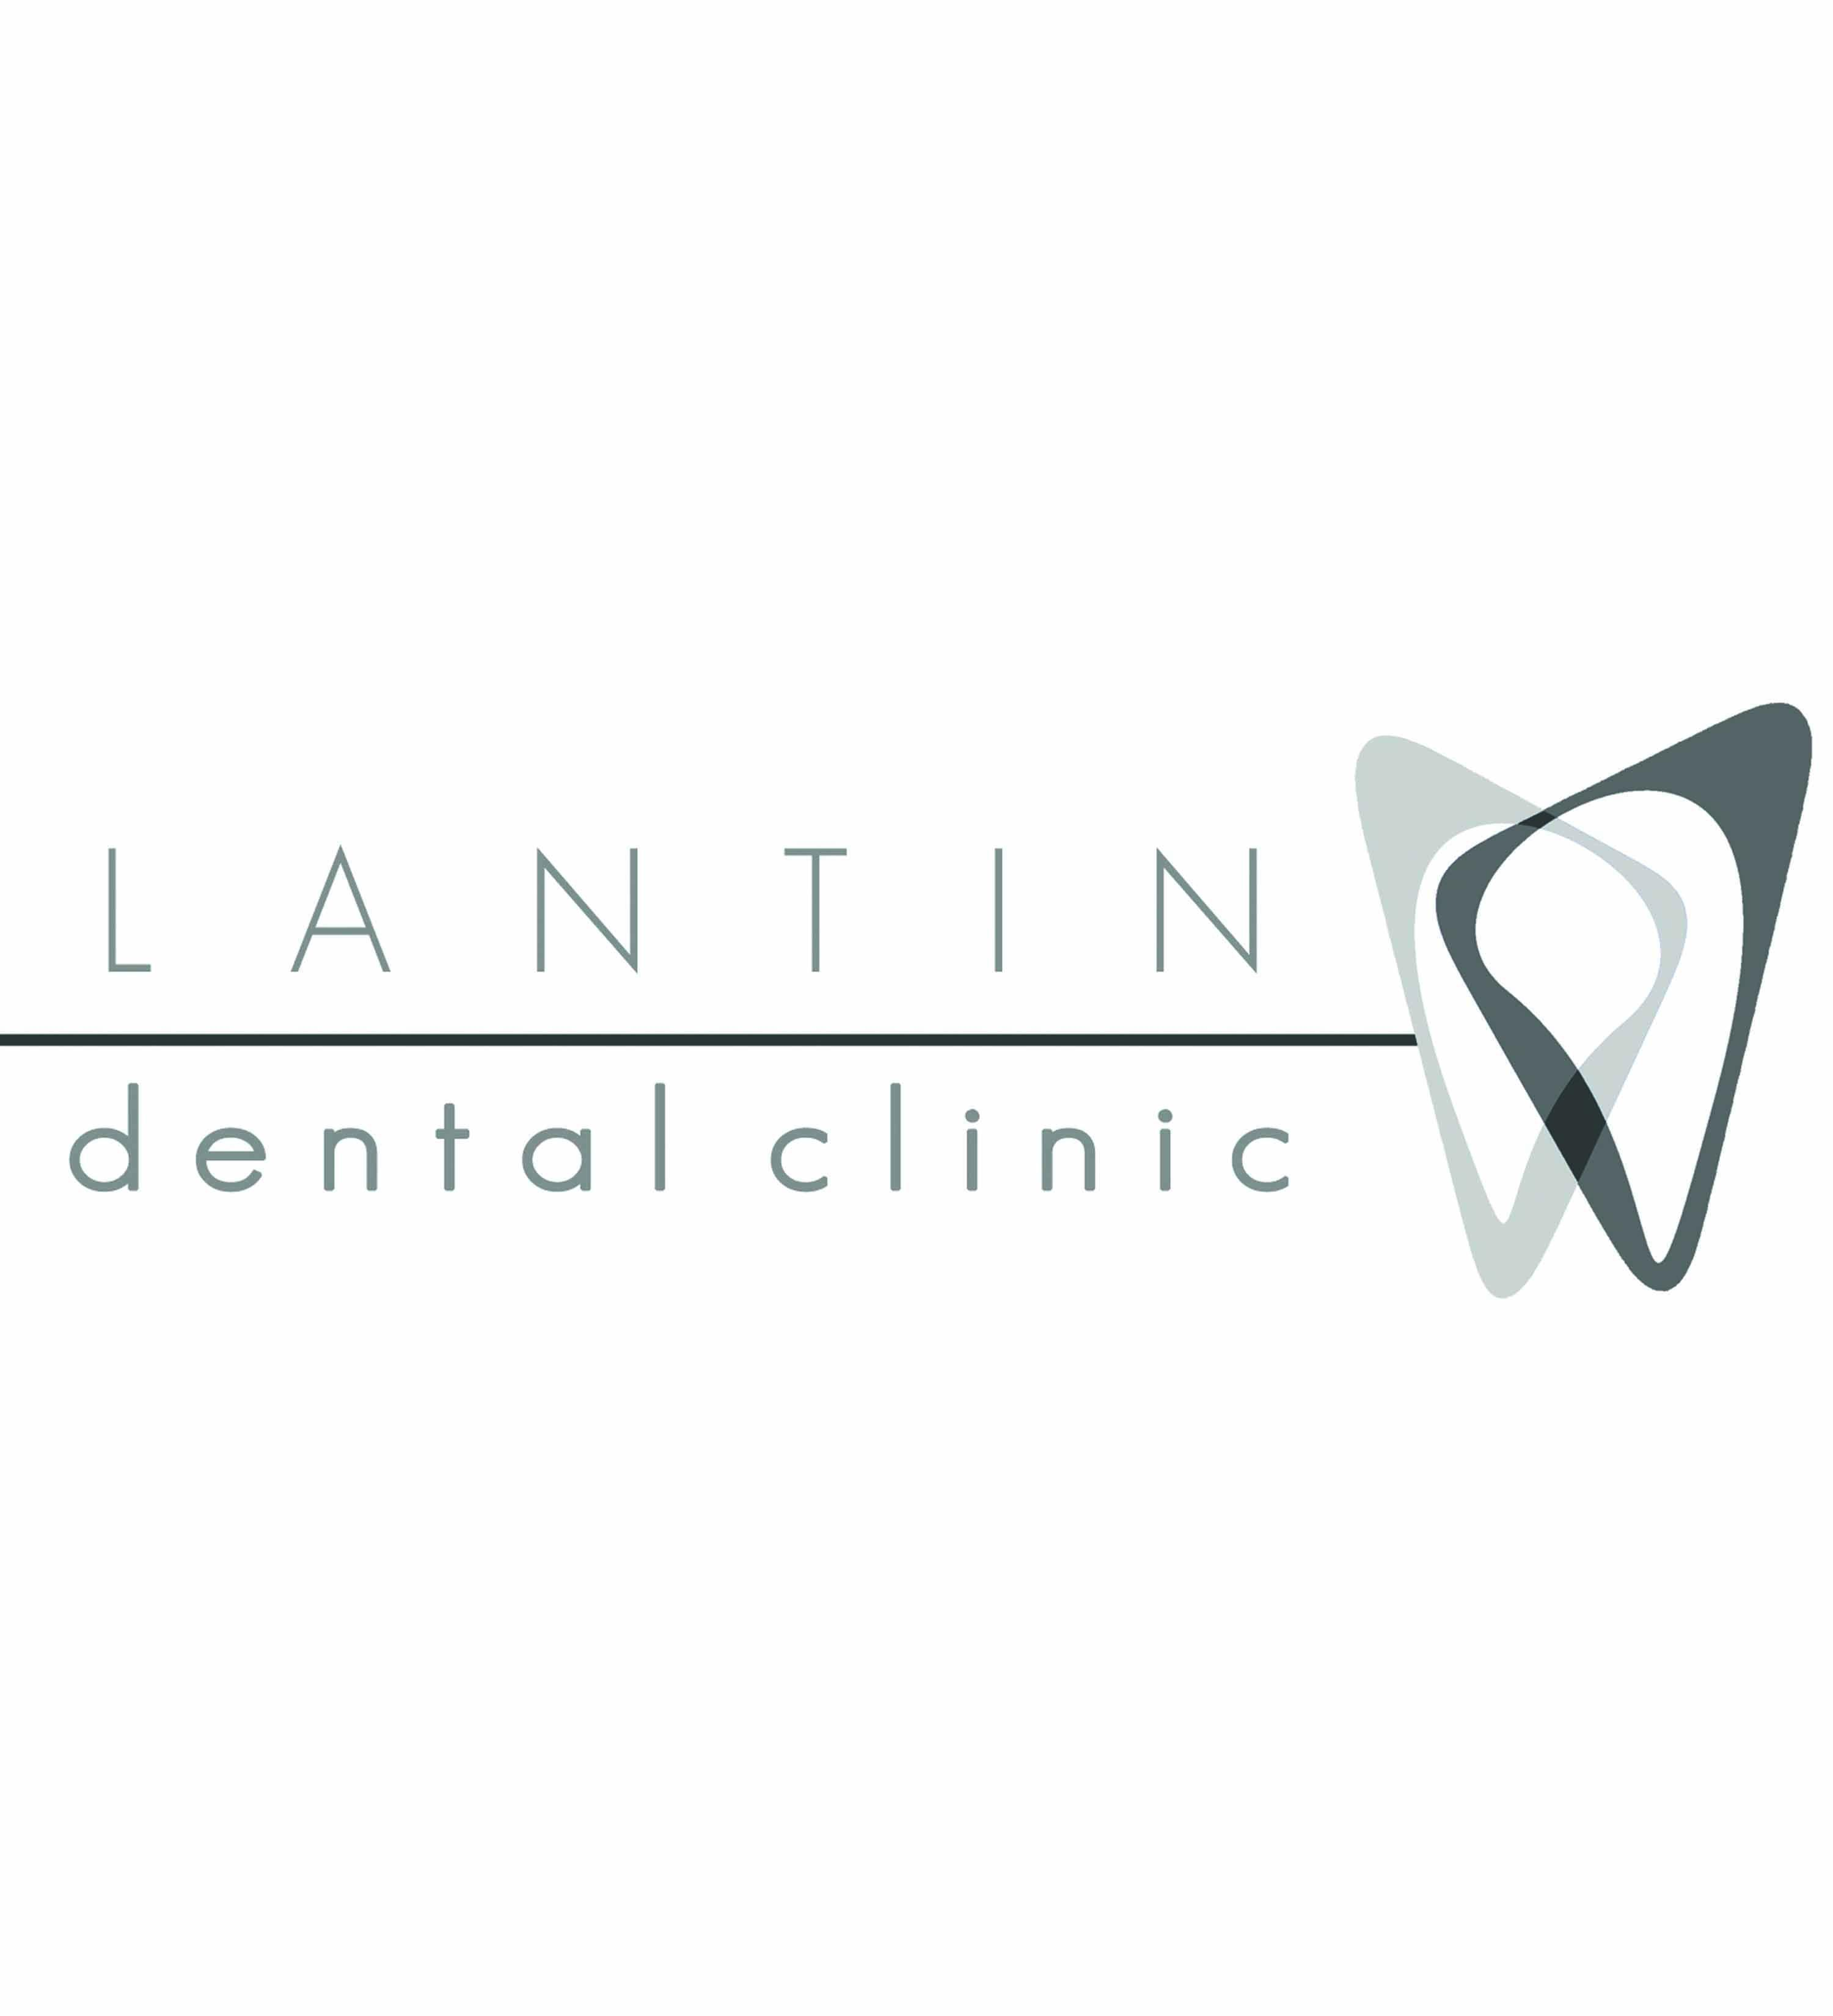 Lantin Dental Clinic